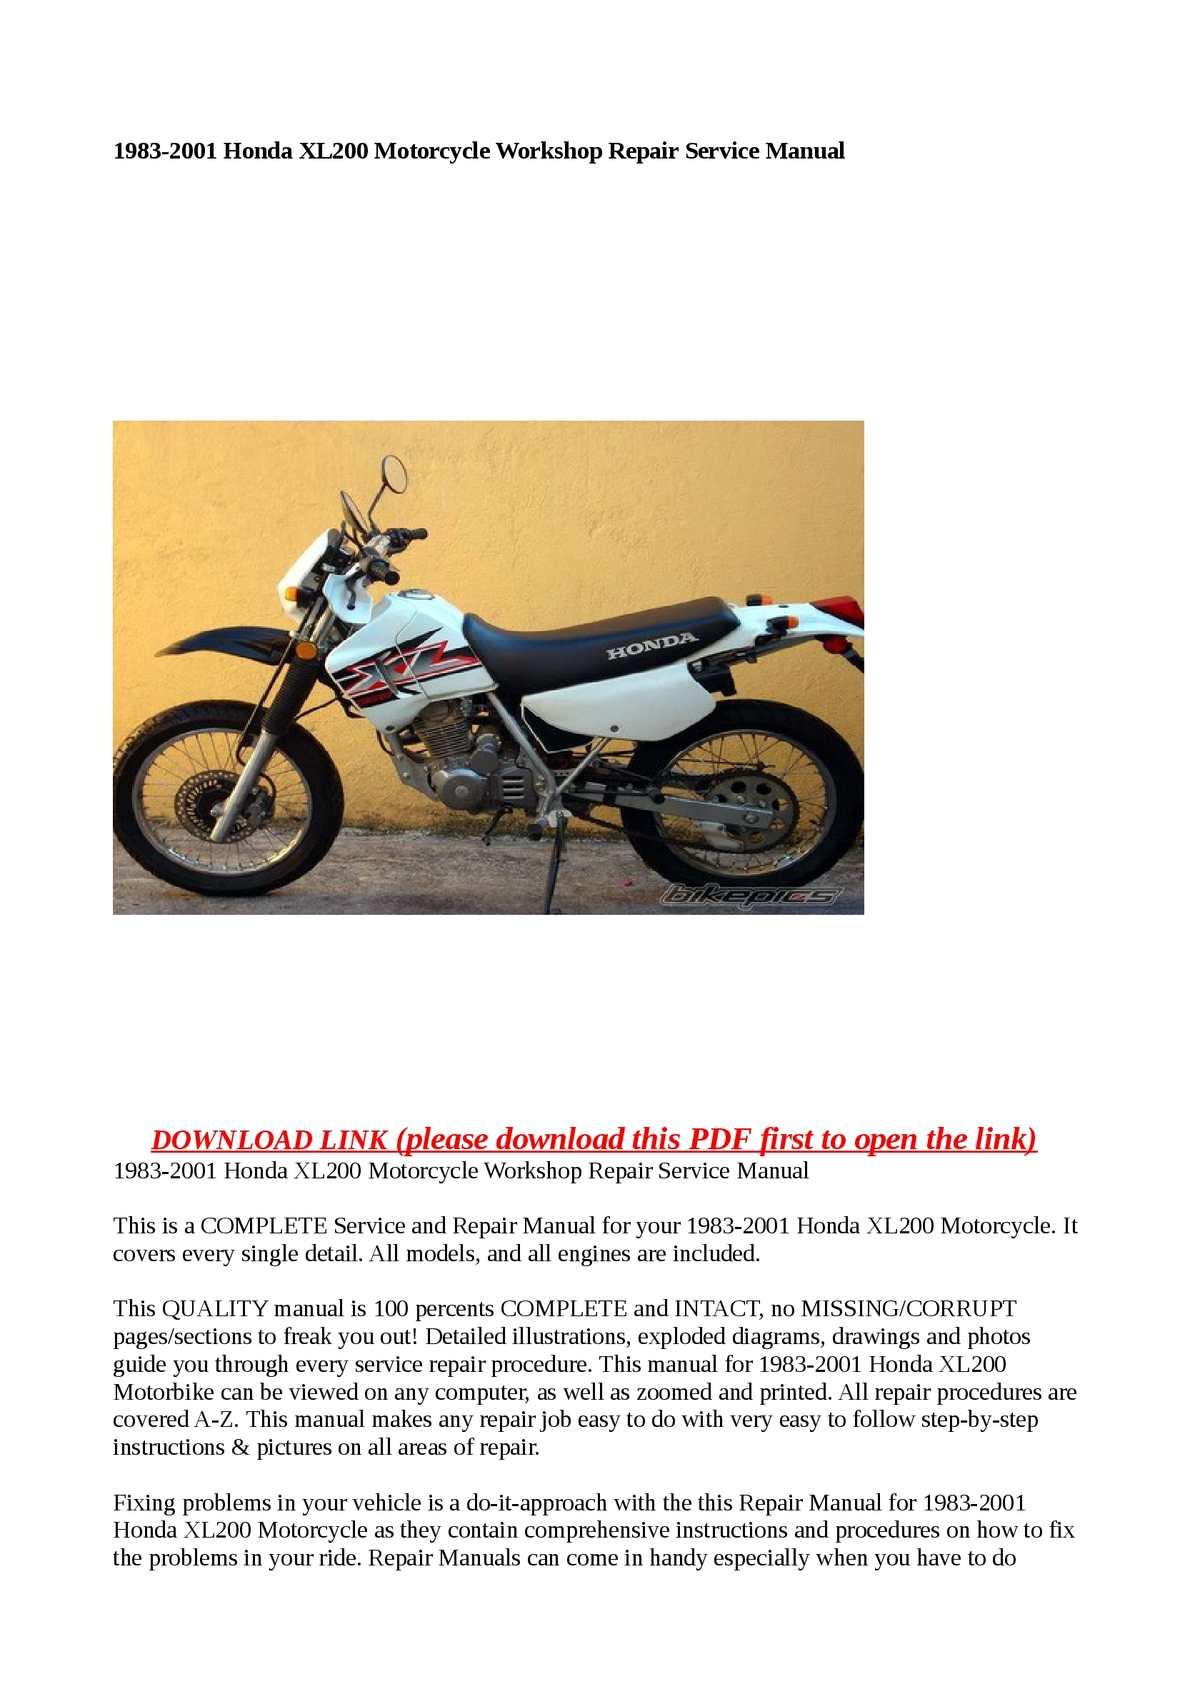 Calaméo - 1983-2001 Honda XL200 Motorcycle Workshop Repair Service Manual